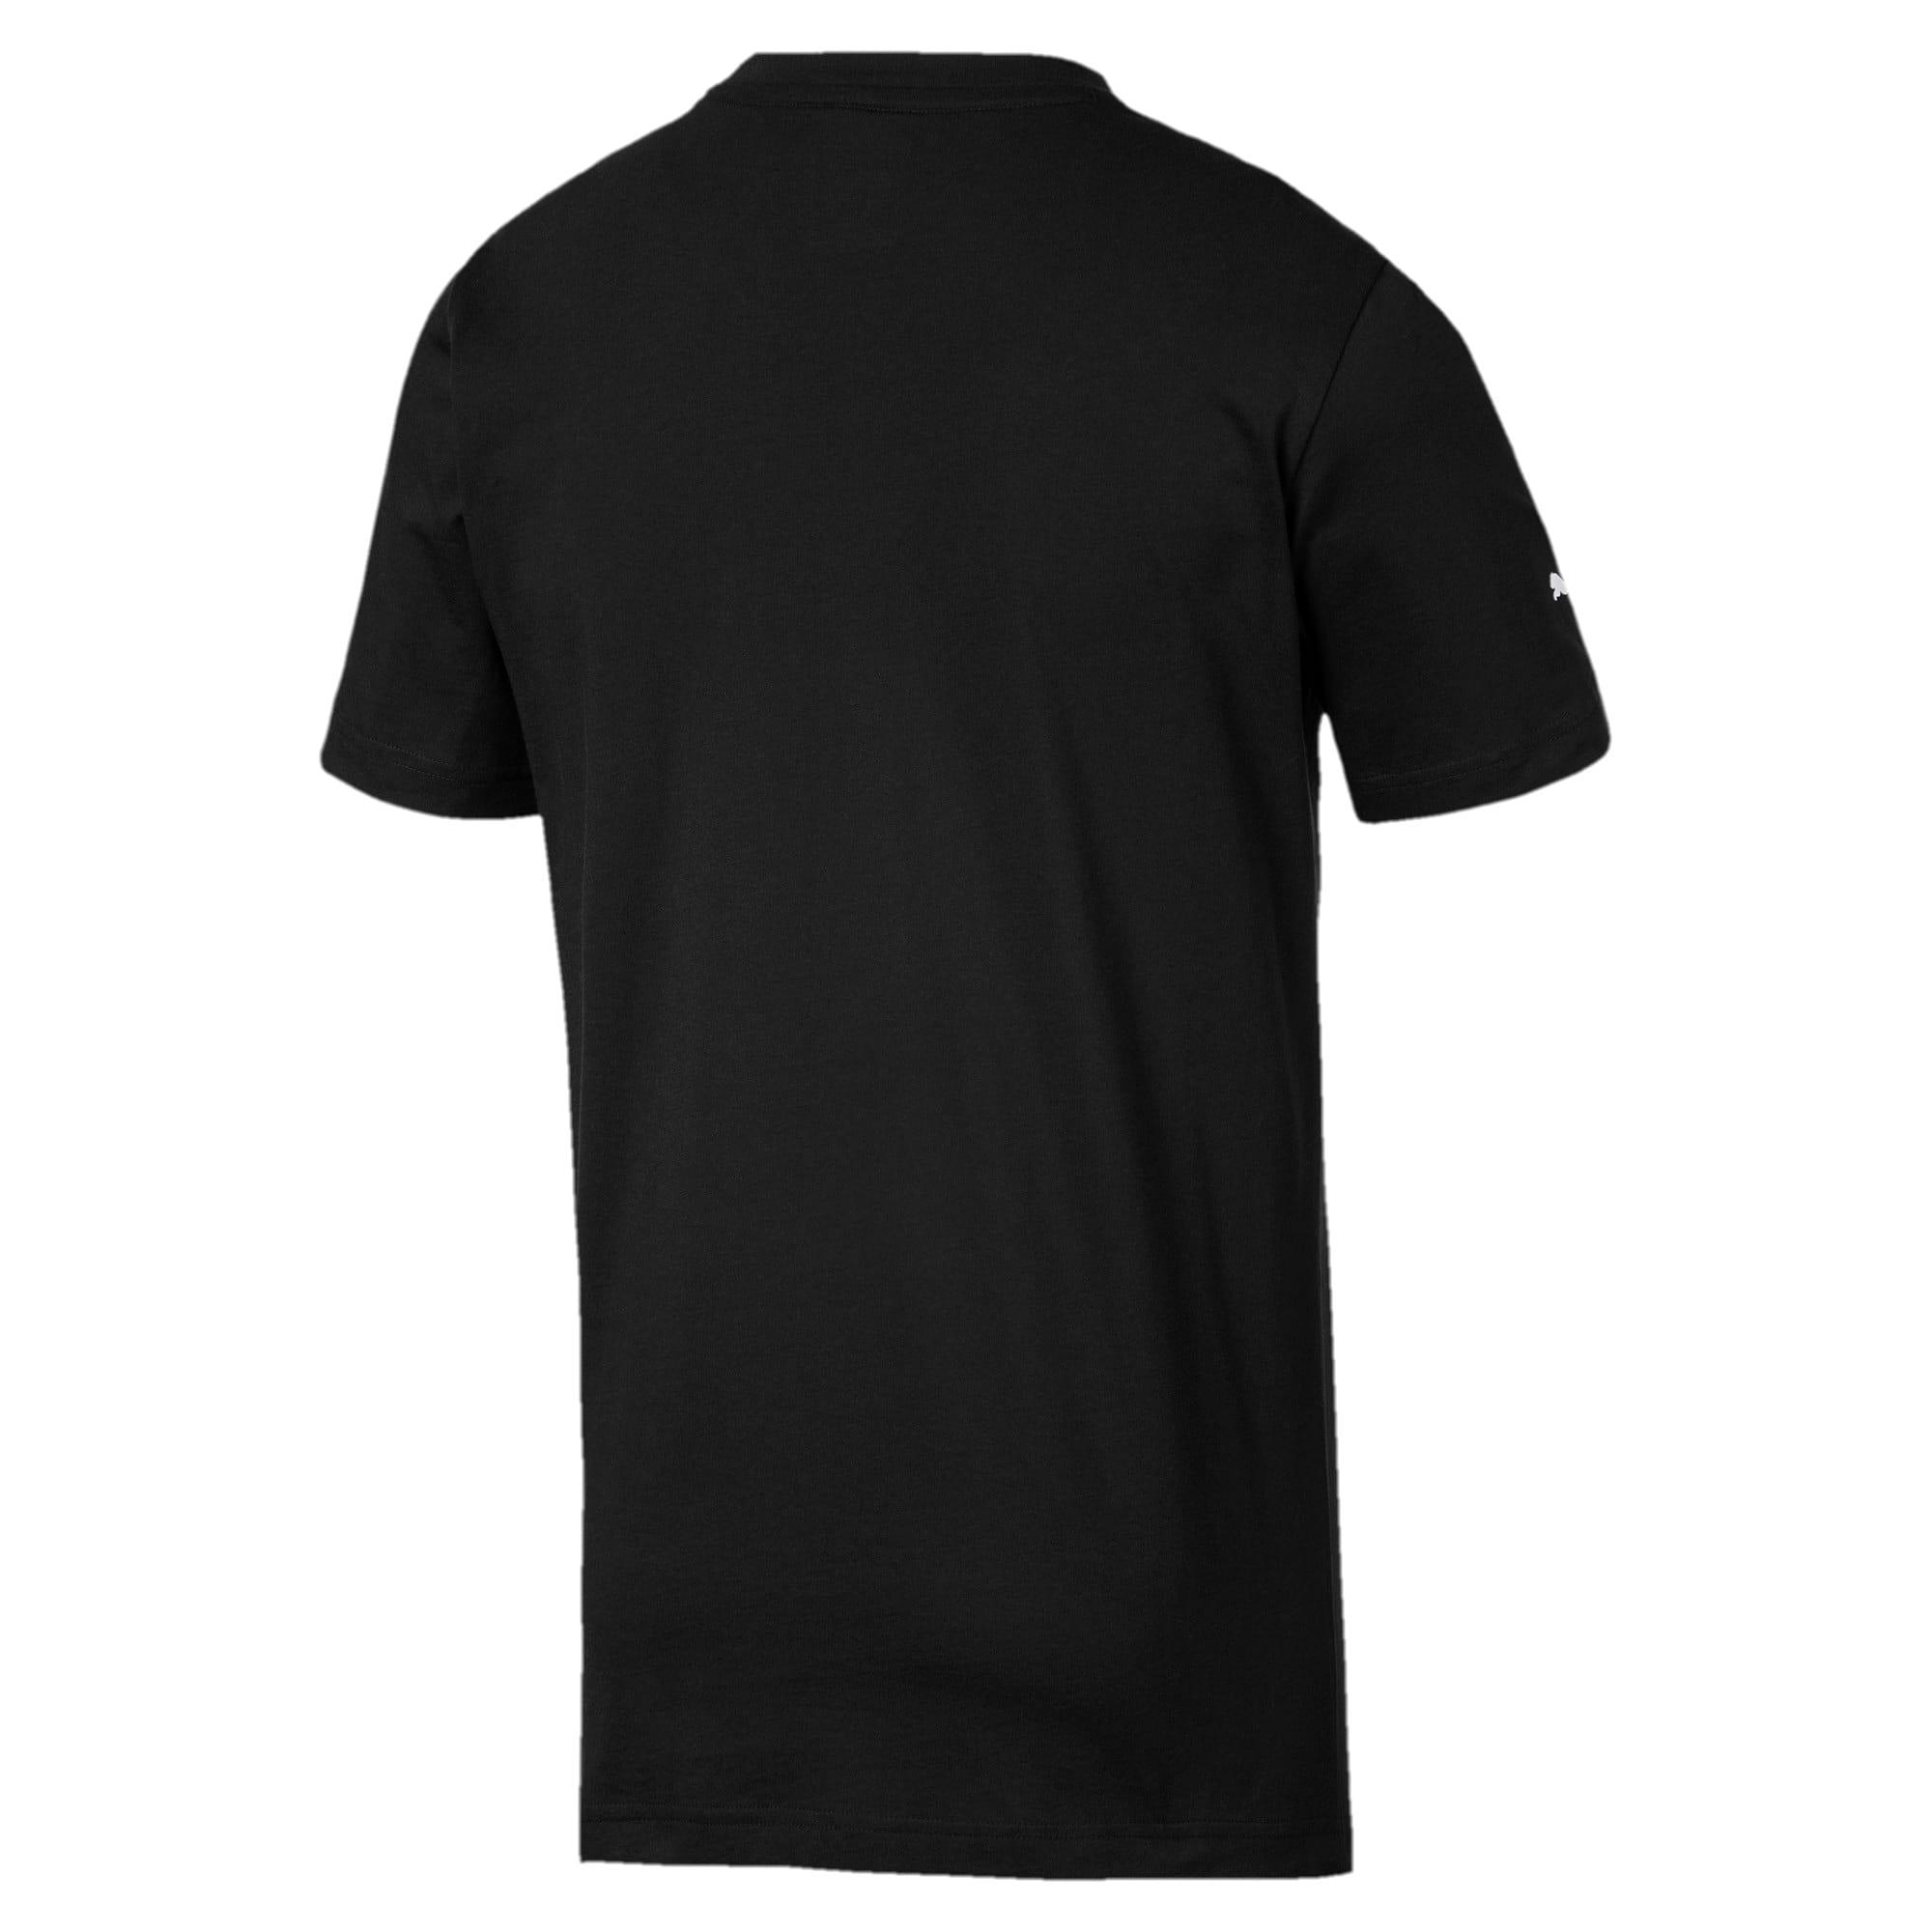 Thumbnail 5 of T-shirt Ferrari Big Shield uomo, Puma Black, medium